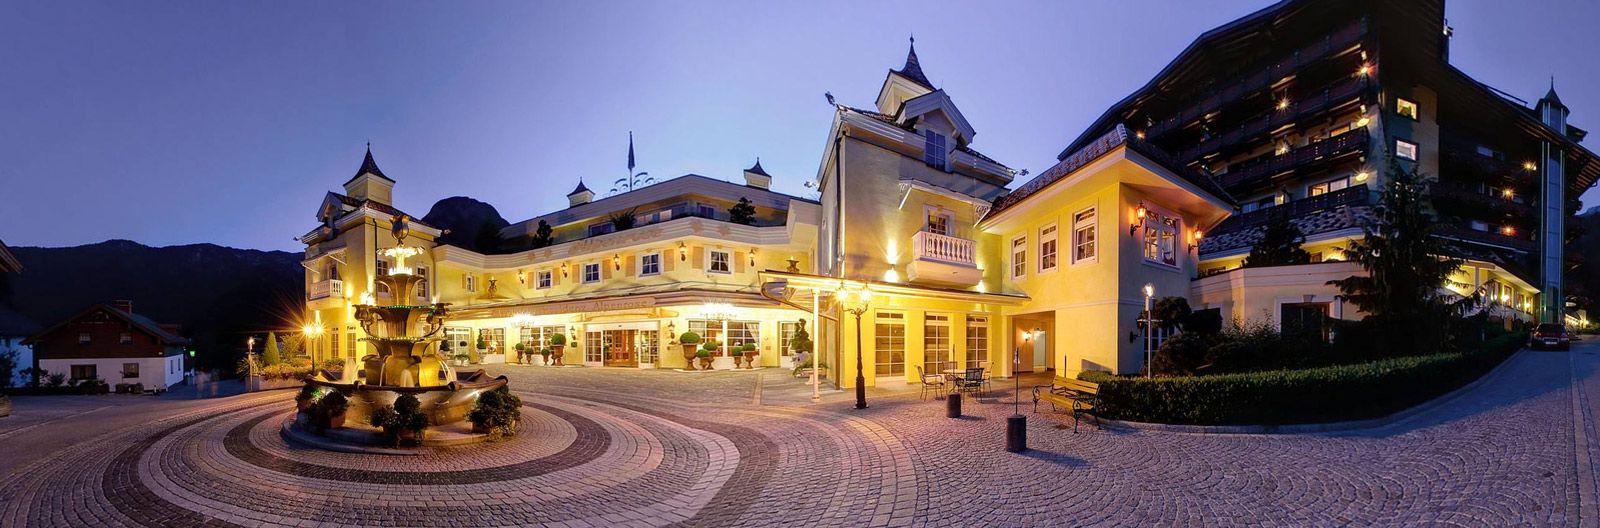 Sporthotel alpenrose wellness residenz maurach achensee for Design hotel achensee